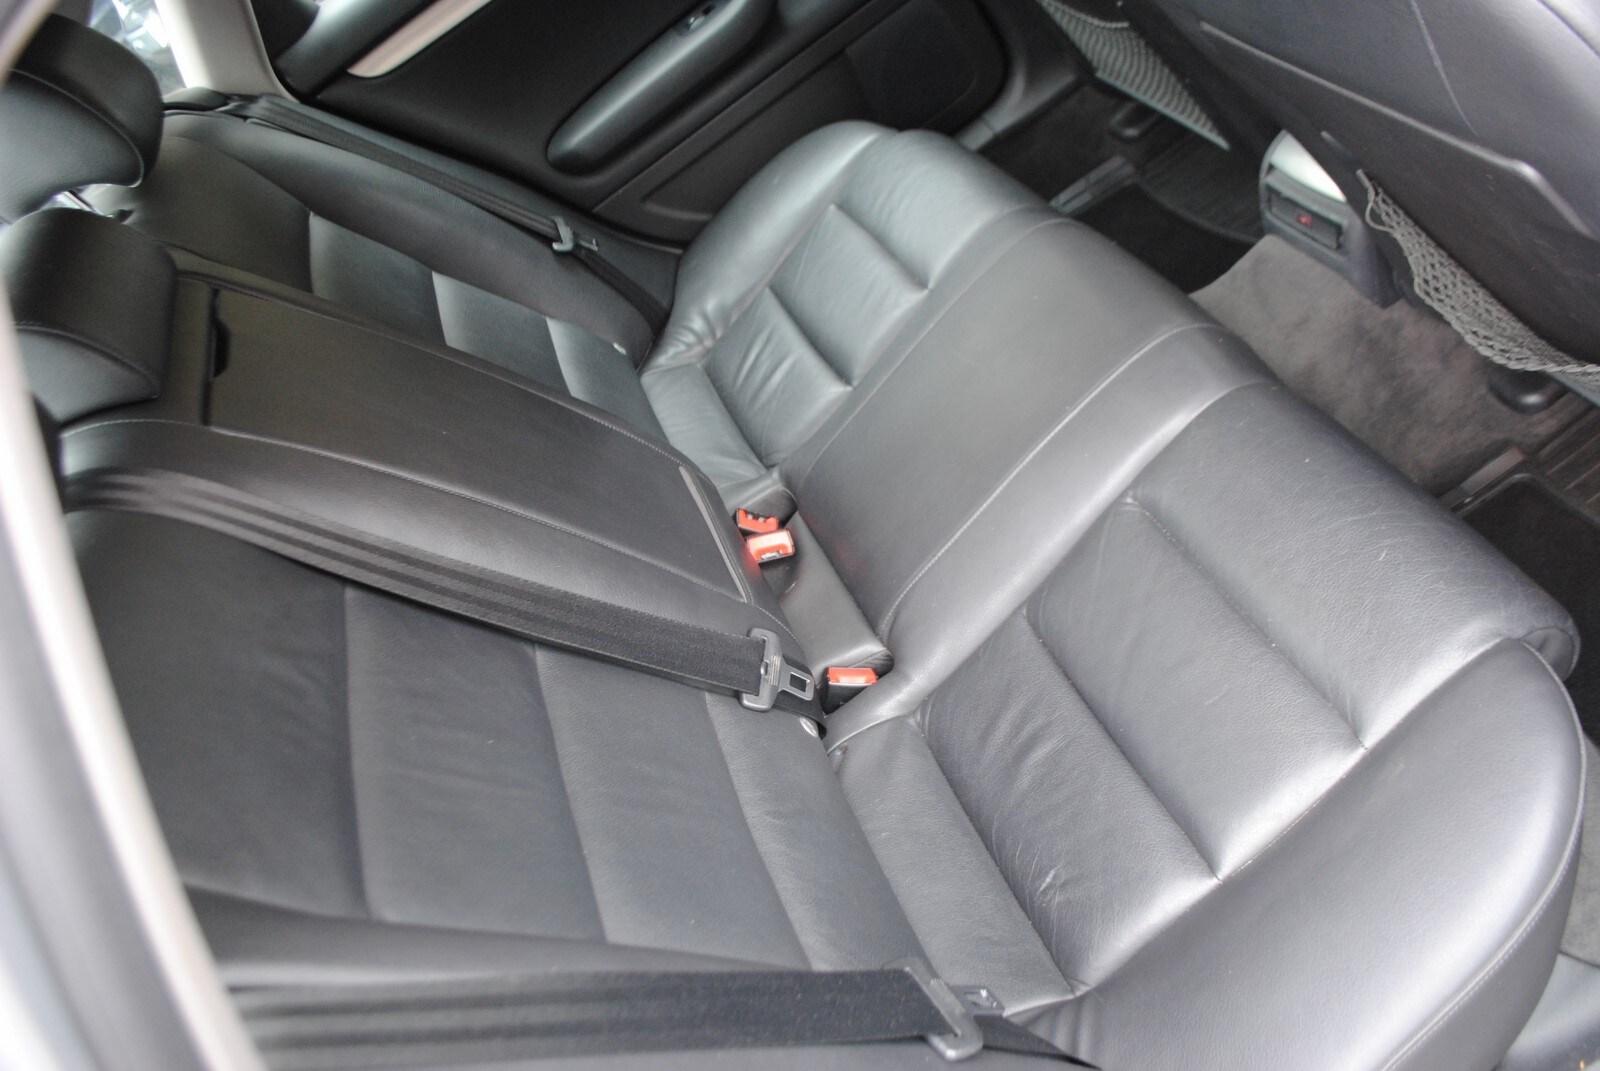 used 2004 audi a4 for sale west milford nj rh ramseycorp com 2013 Audi A4 Audi A4 Turbo